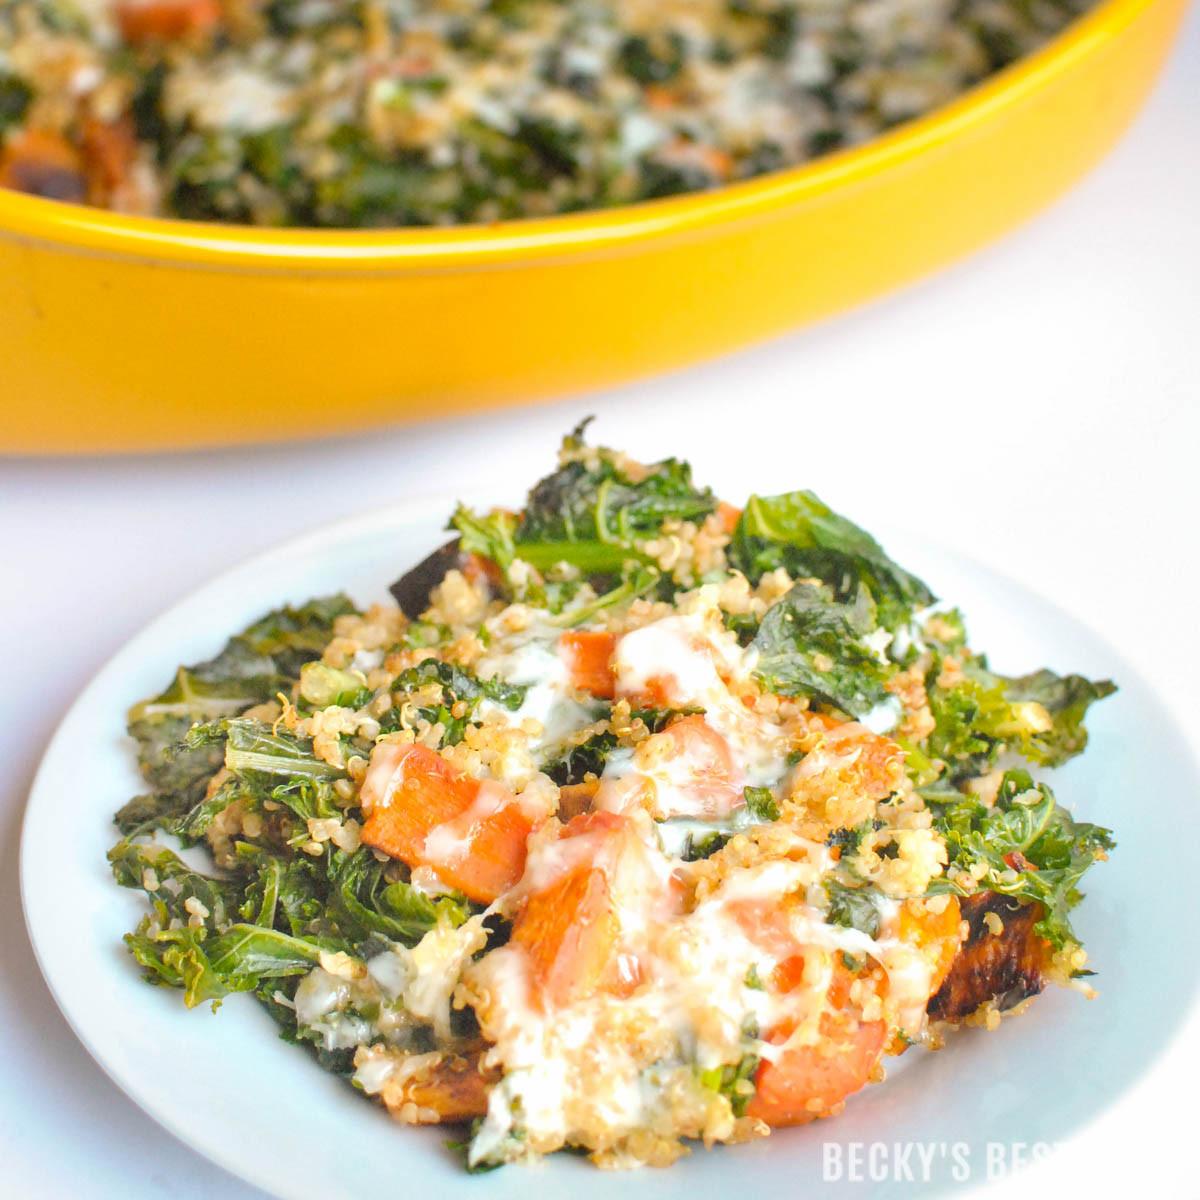 Vegetable Casserole Healthy  Kale & Roasted Ve able Quinoa Casserole